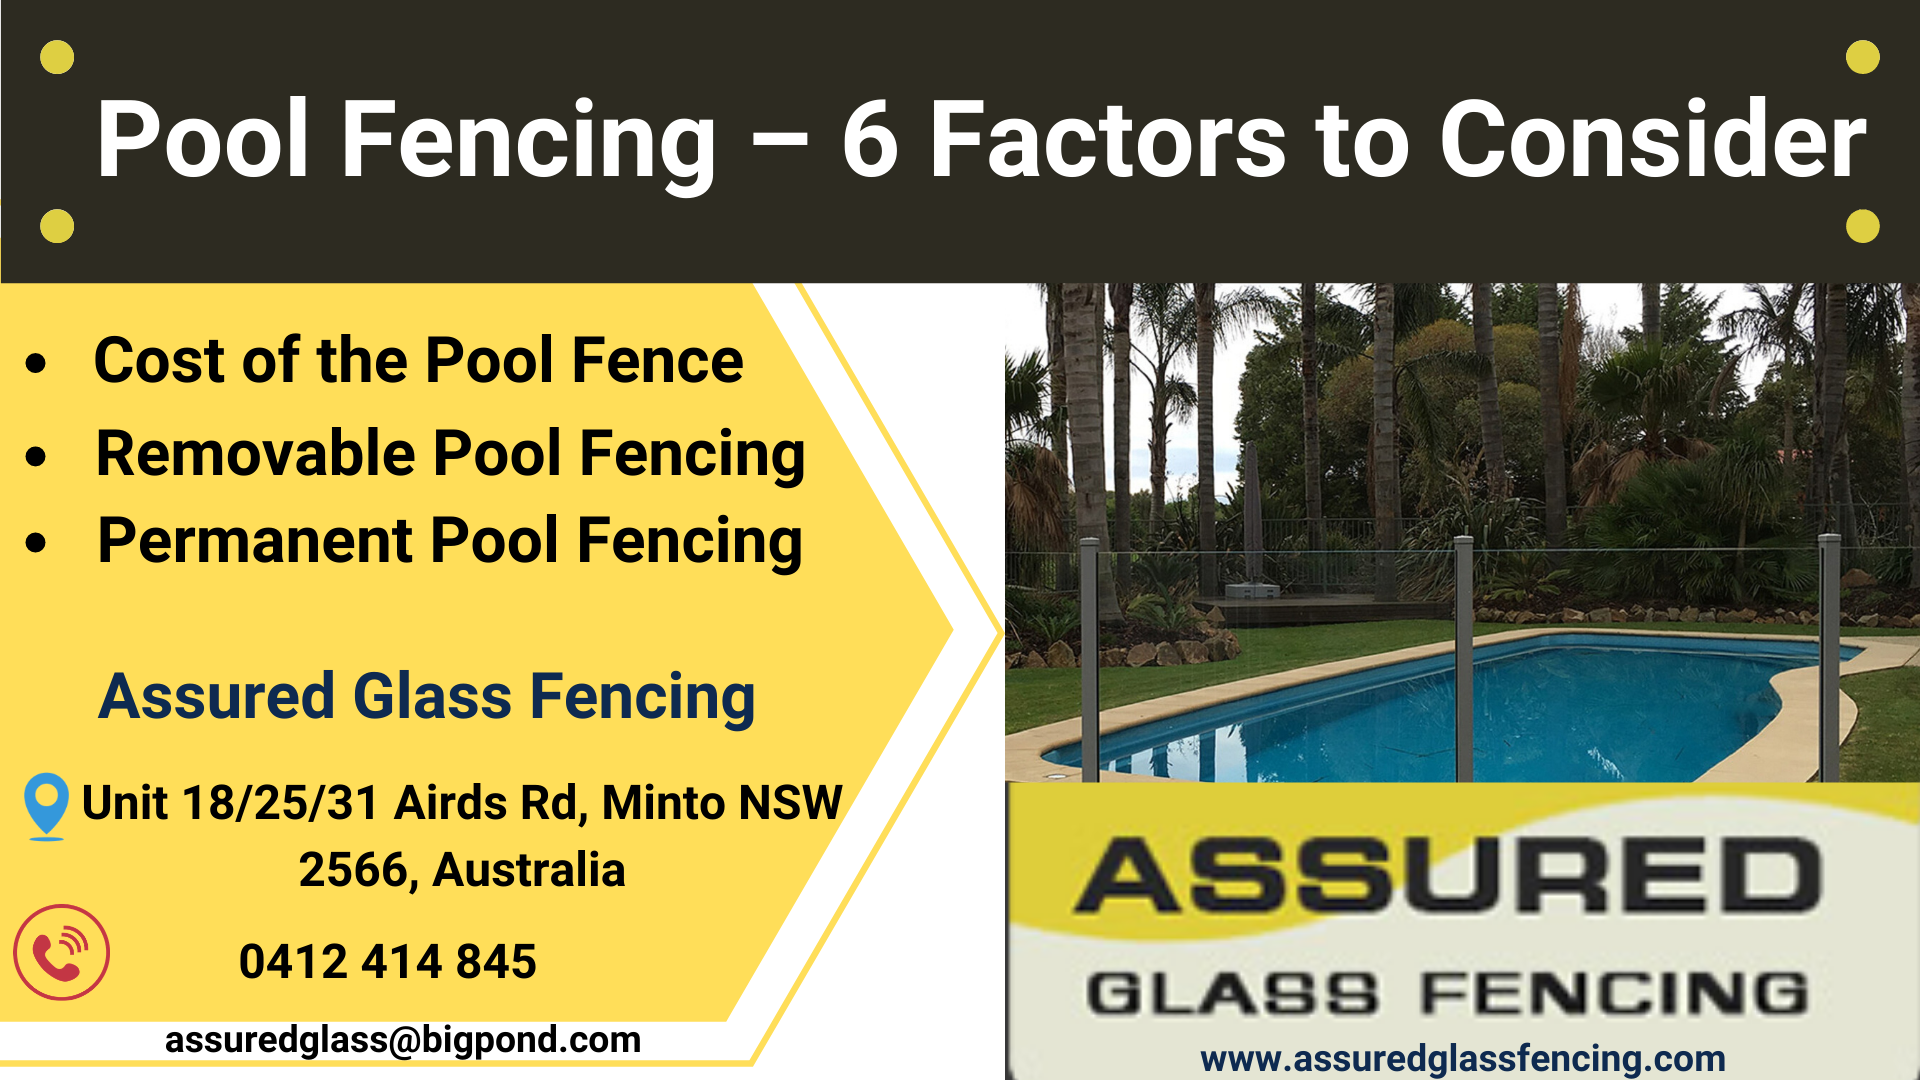 Assured Fencingglass Profile Pinterest